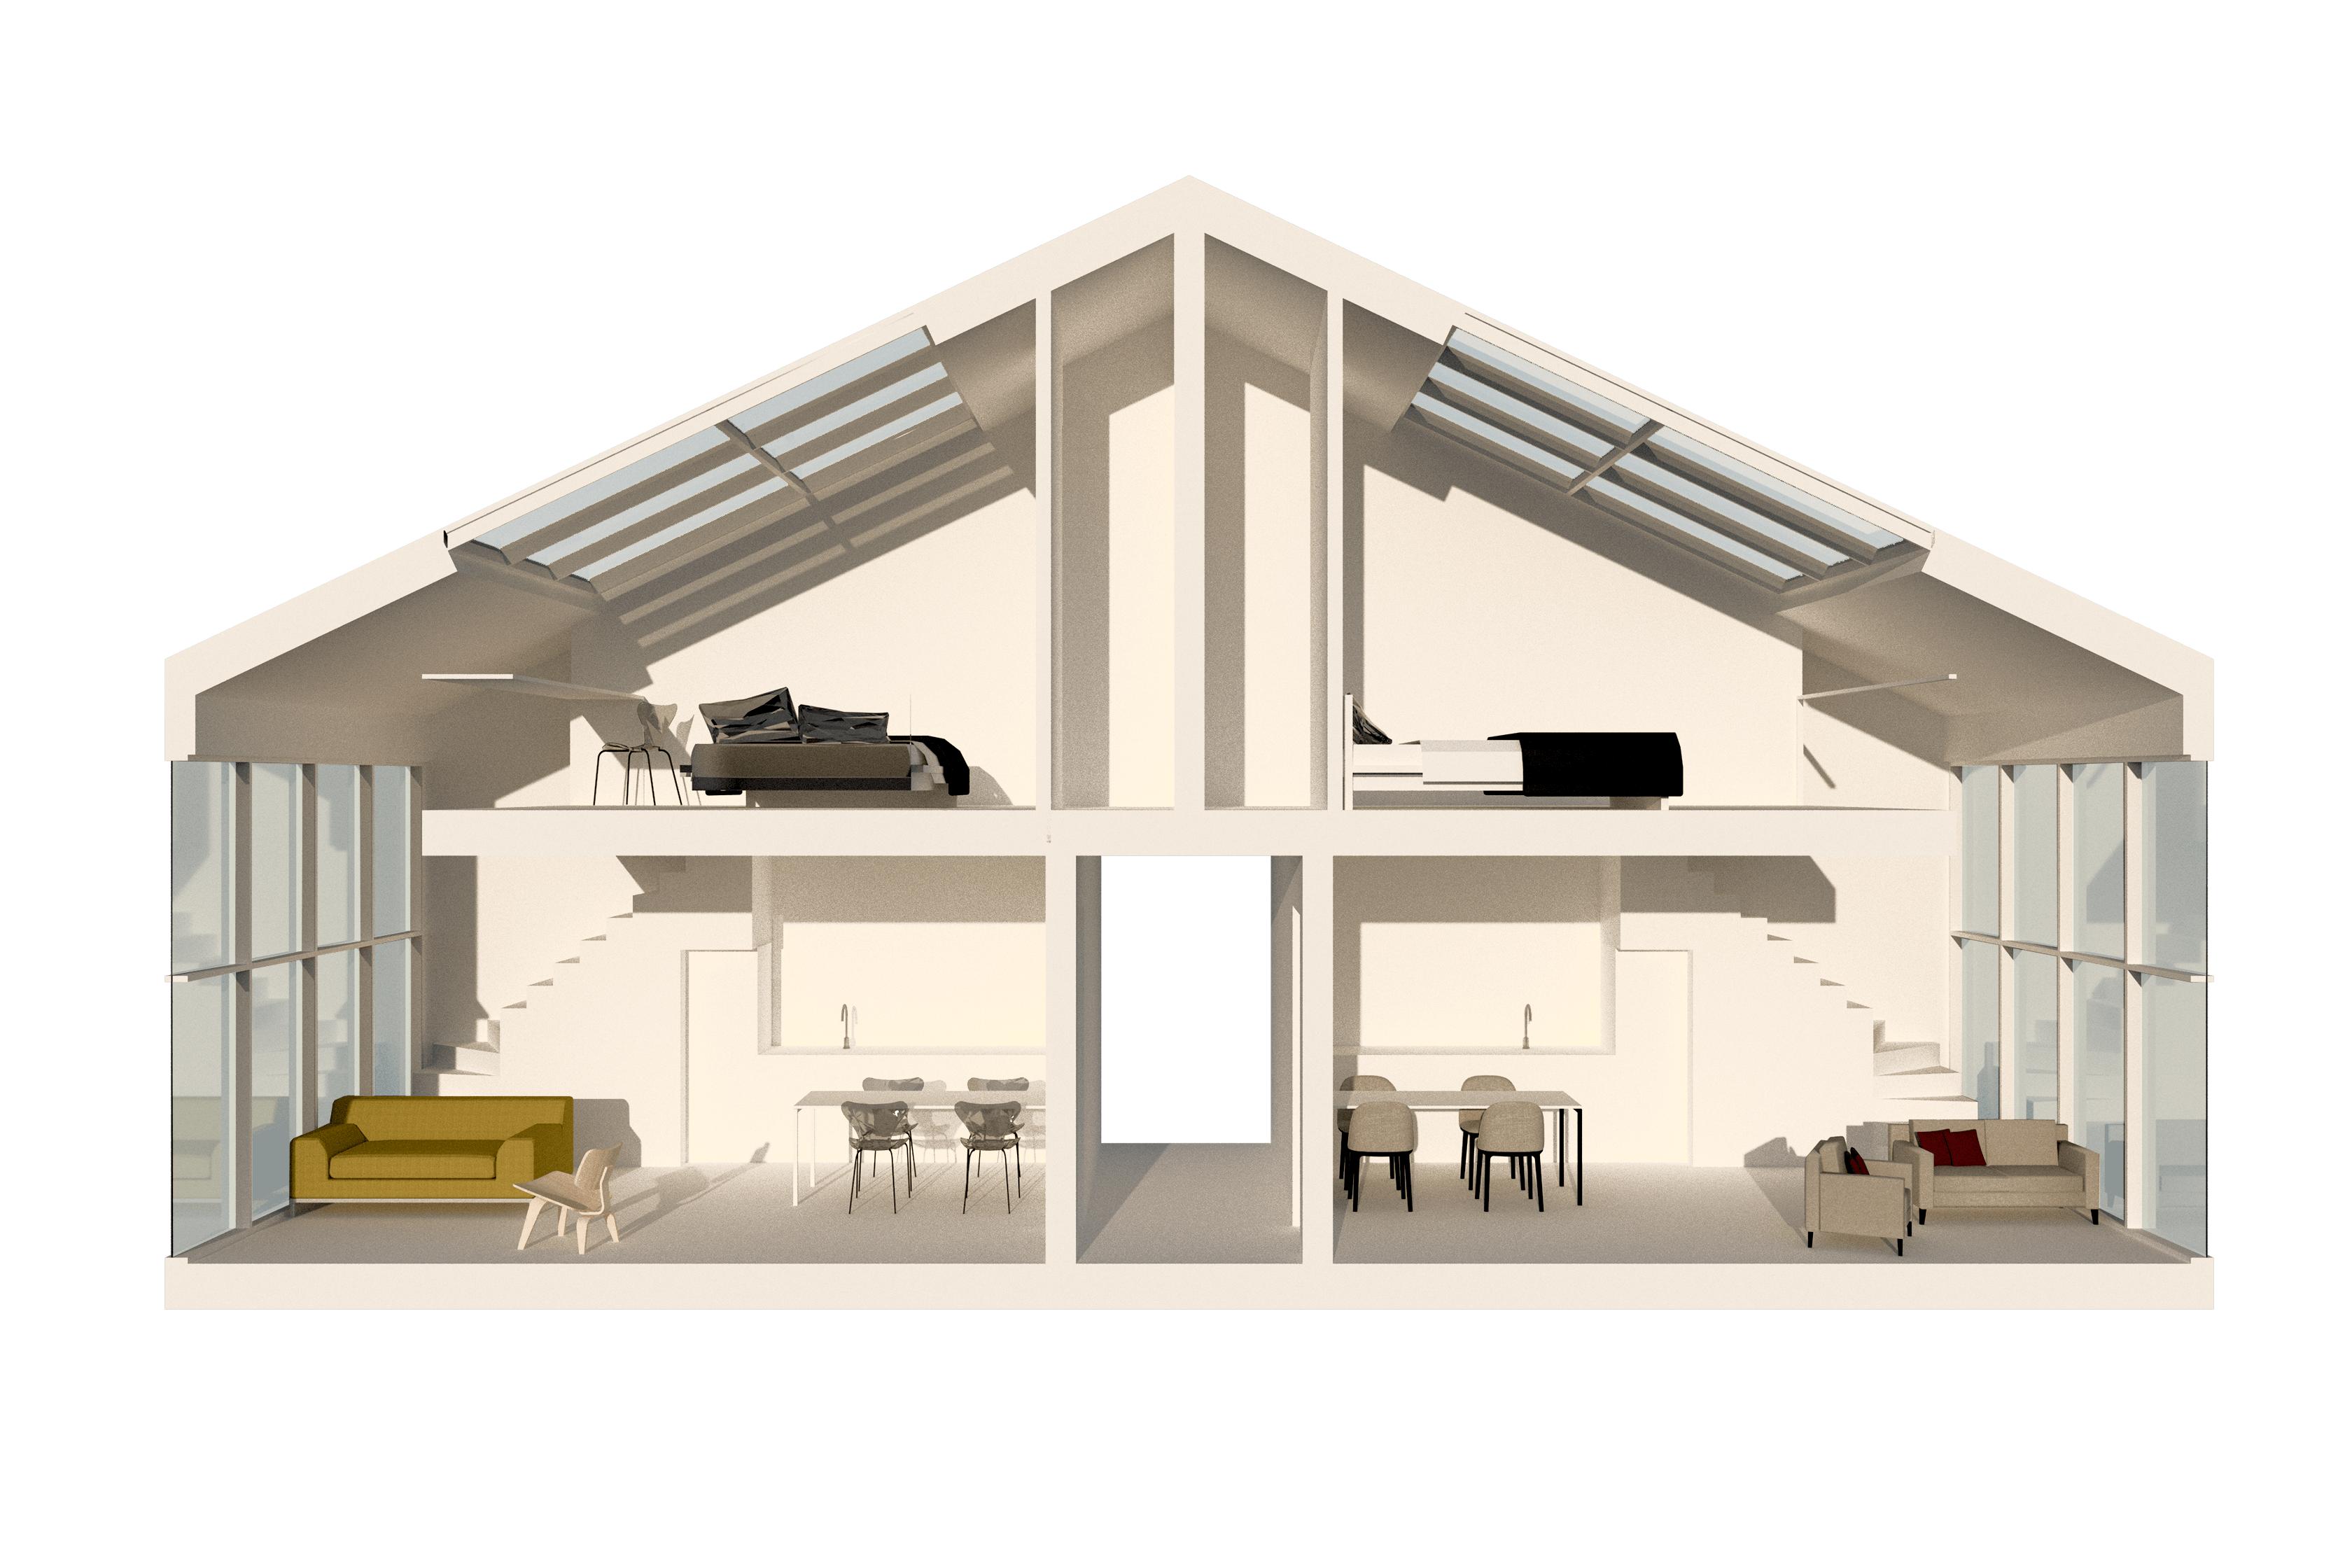 studioBEUVING -starter lofts hilversum -3D model principe